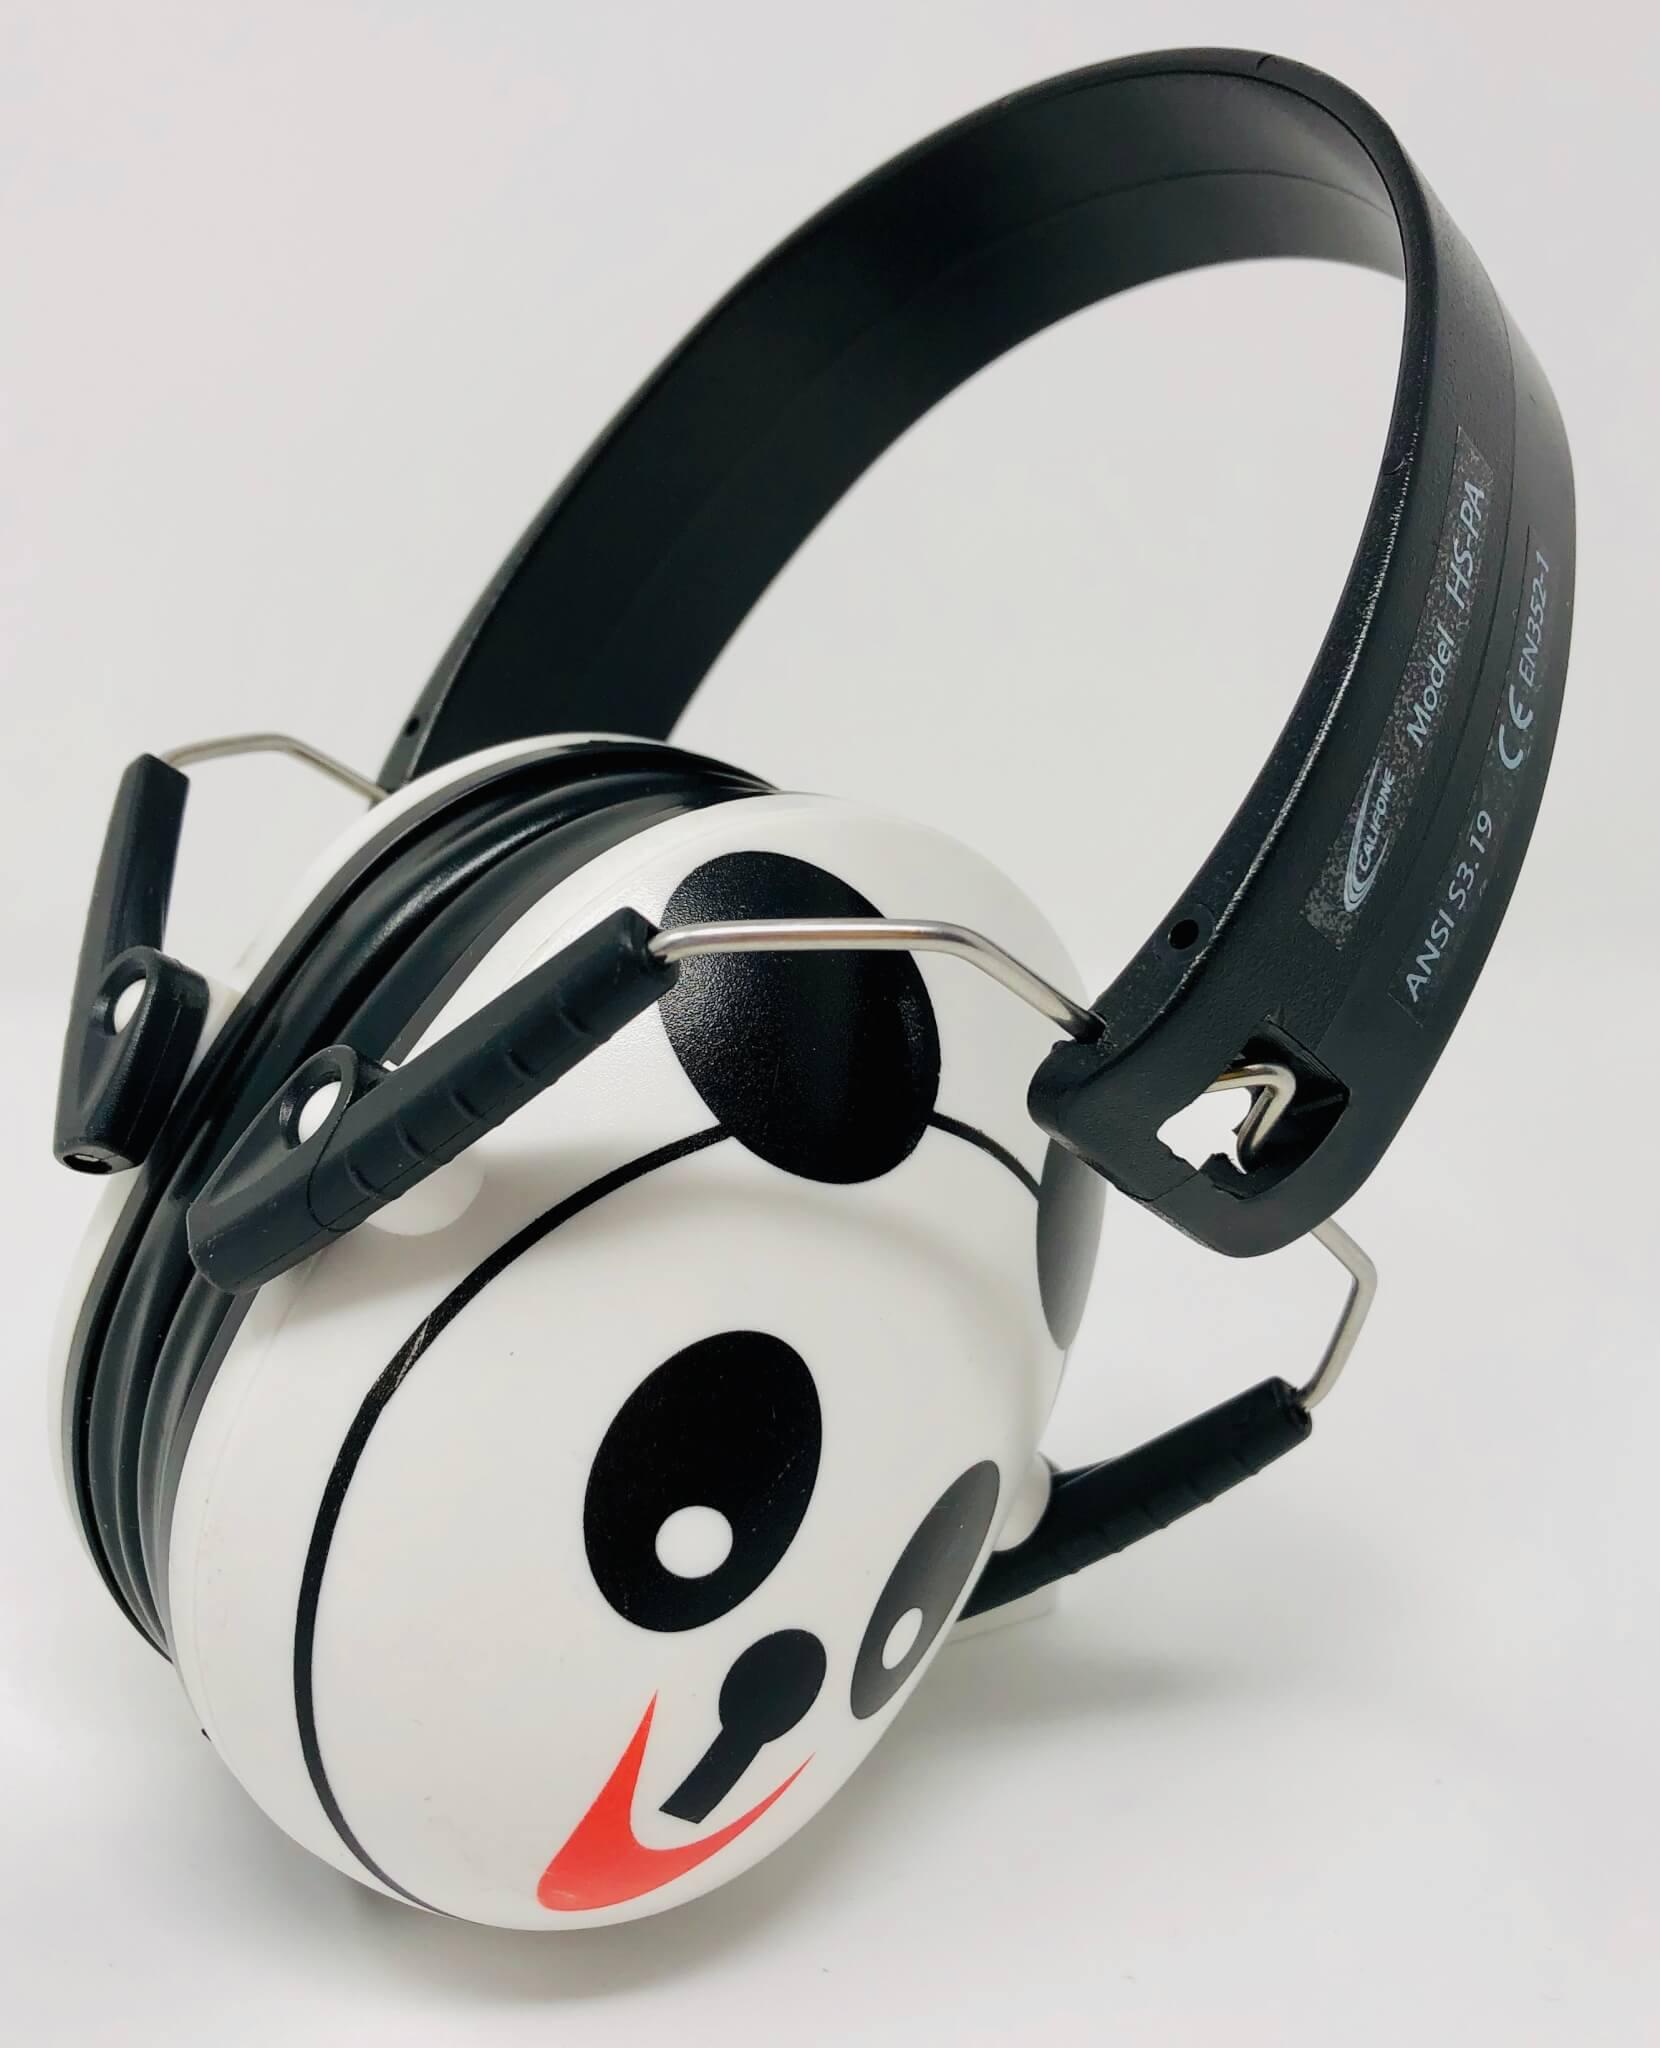 Coquilles anti-bruit (panda) (Califone)